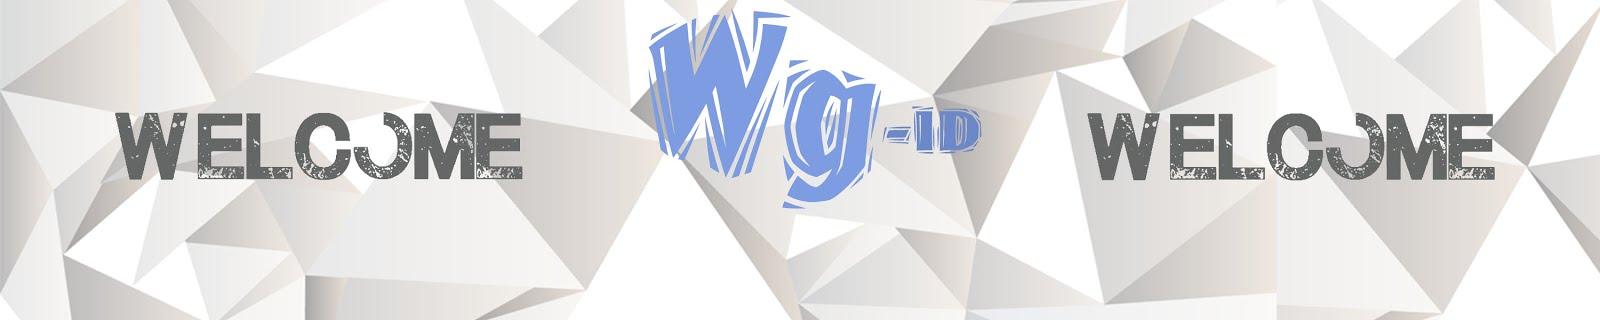 wg_id